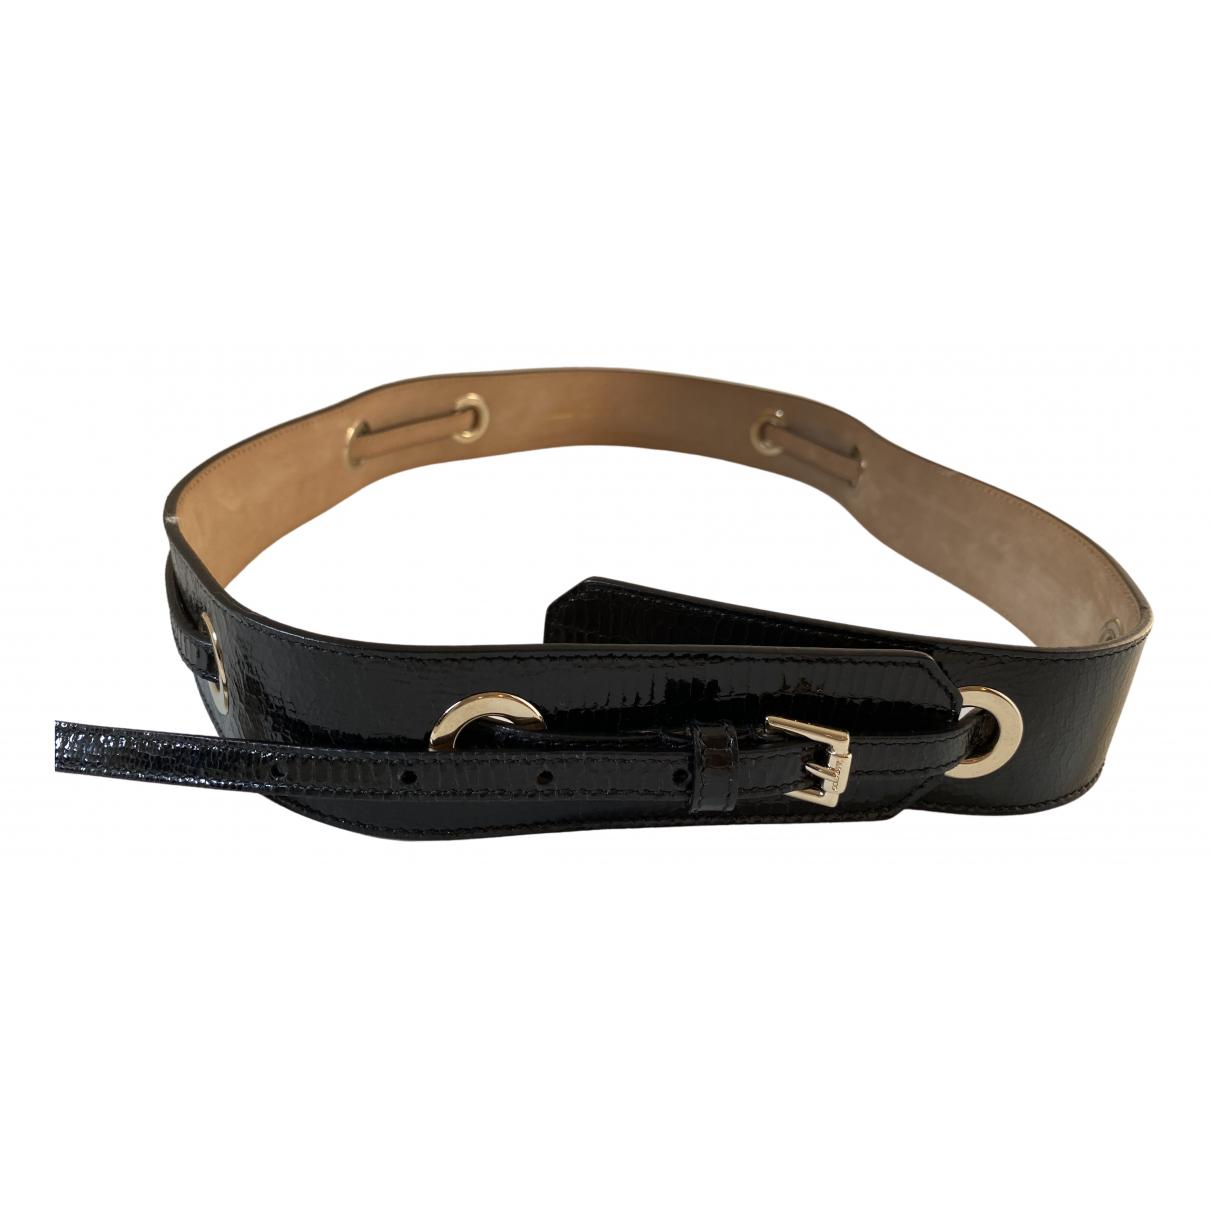 Cinturon de Piton Jimmy Choo